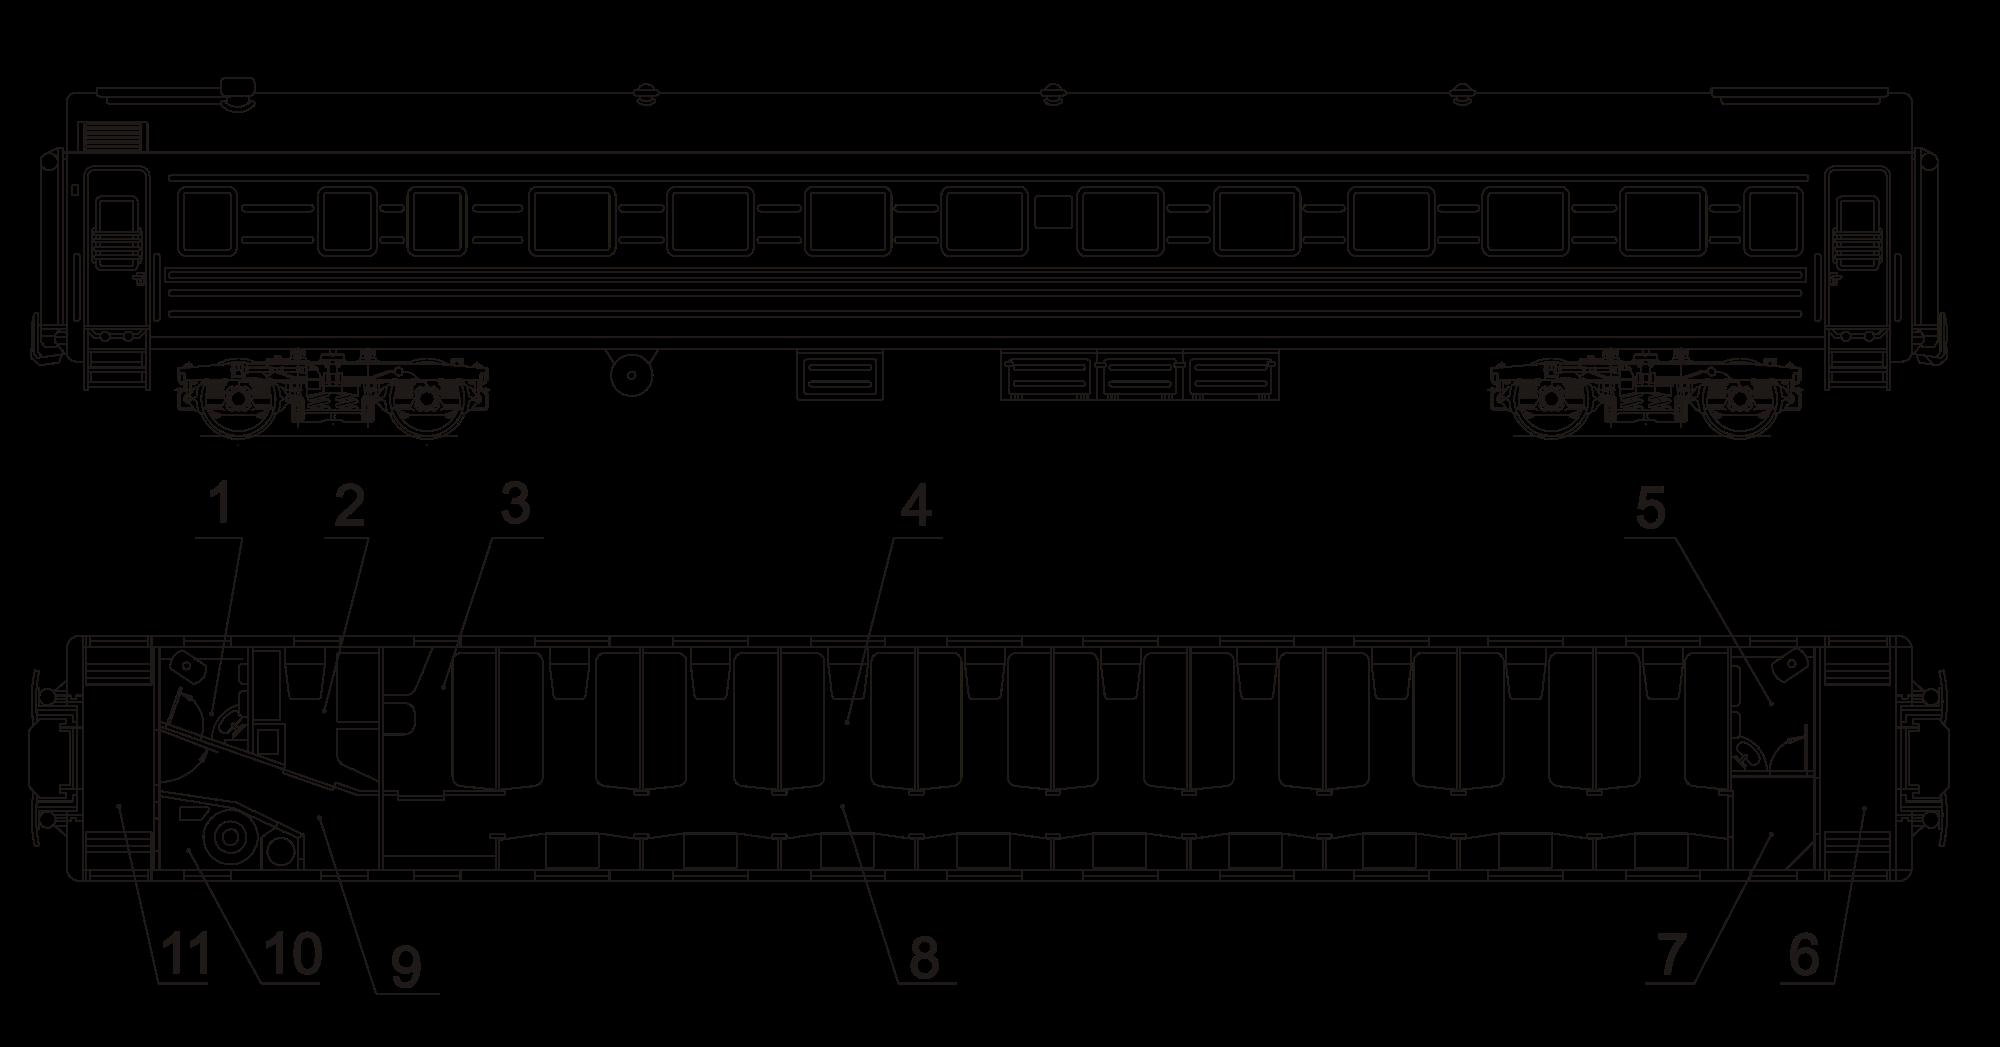 подготовиться вагон плацкарт схема картинки друг семьи